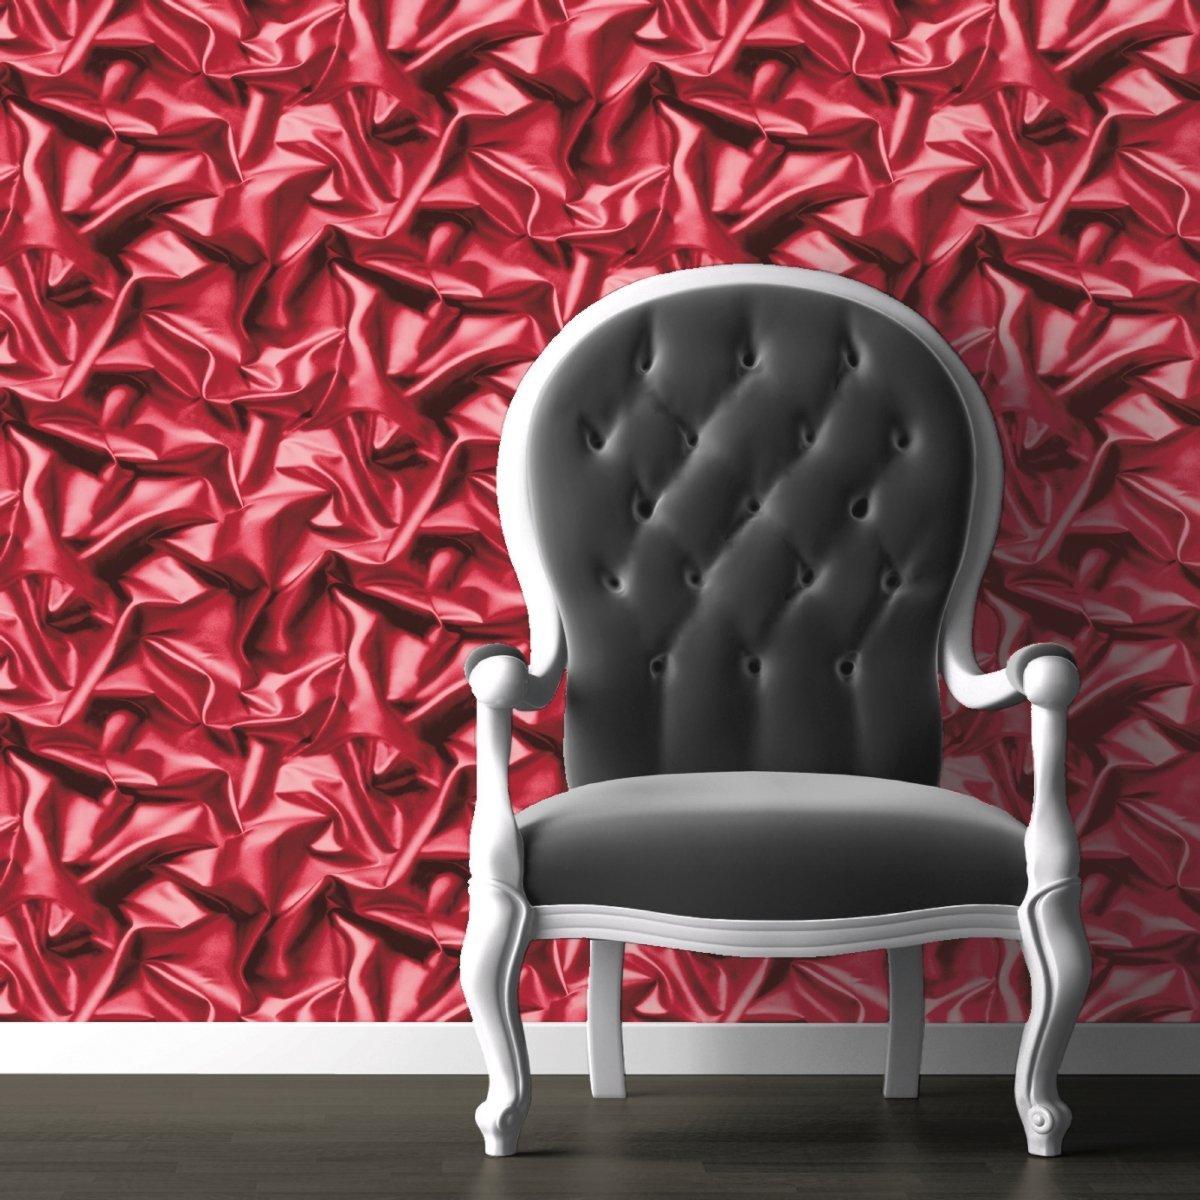 Purple Crushed Velvet Effect Wallpaper 3D Silk Fabric Luxury Heavyweight Feature